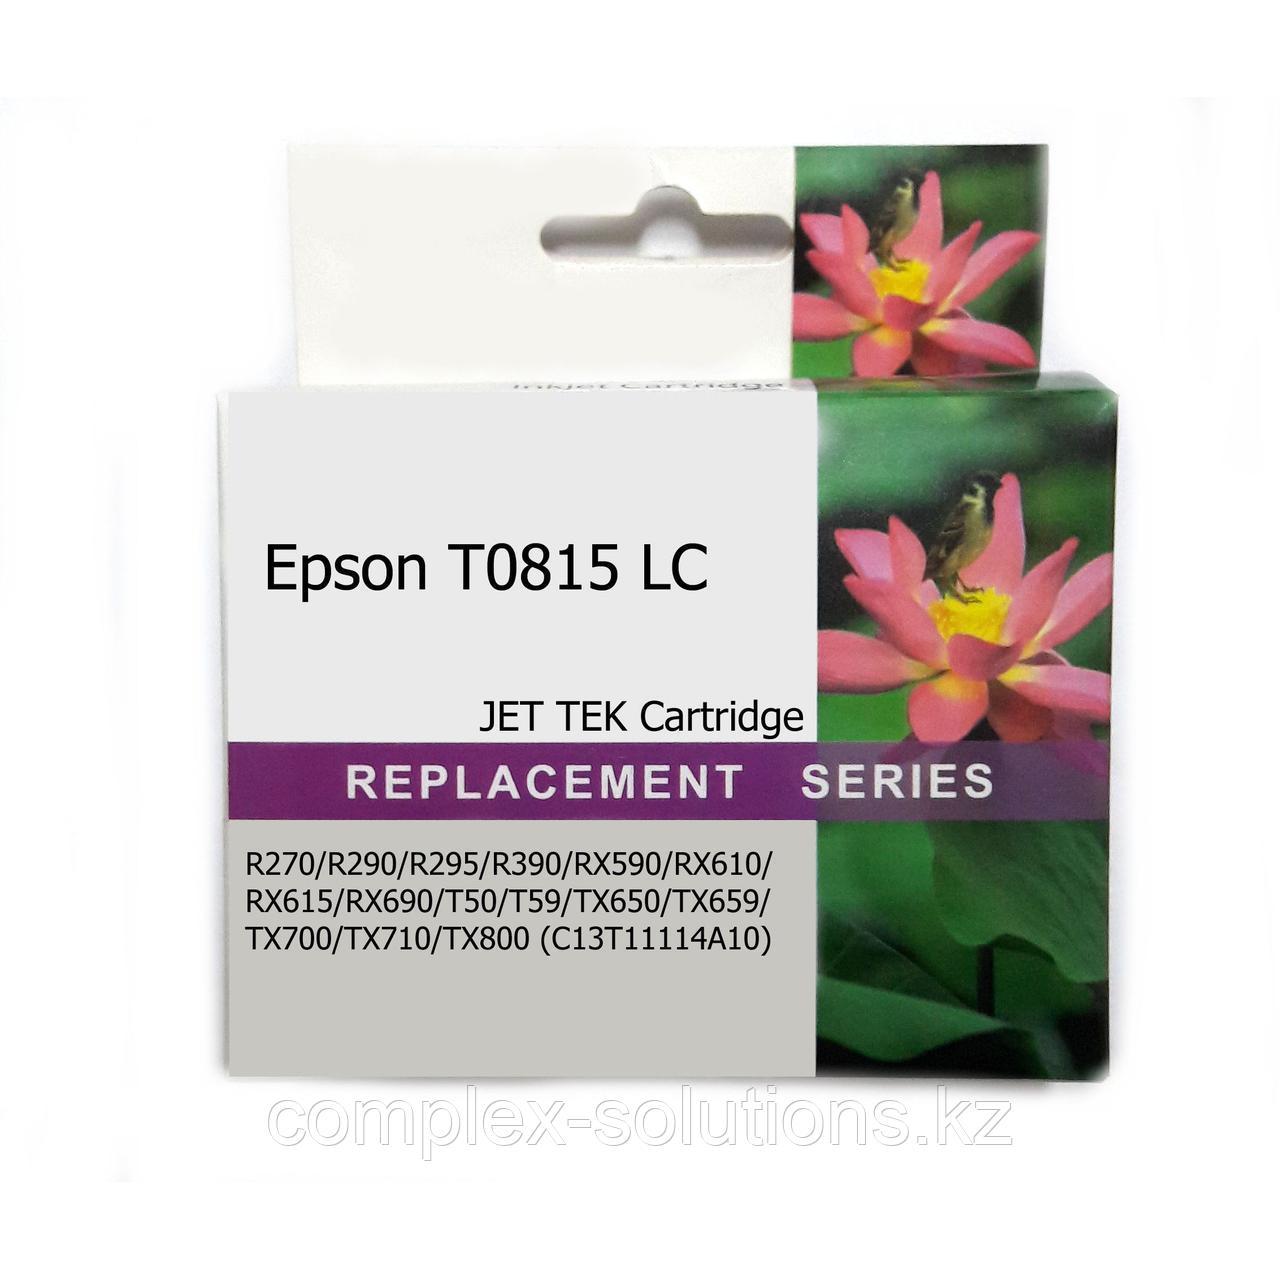 Картридж EPSON T0815 LC JET TEK   [качественный дубликат]